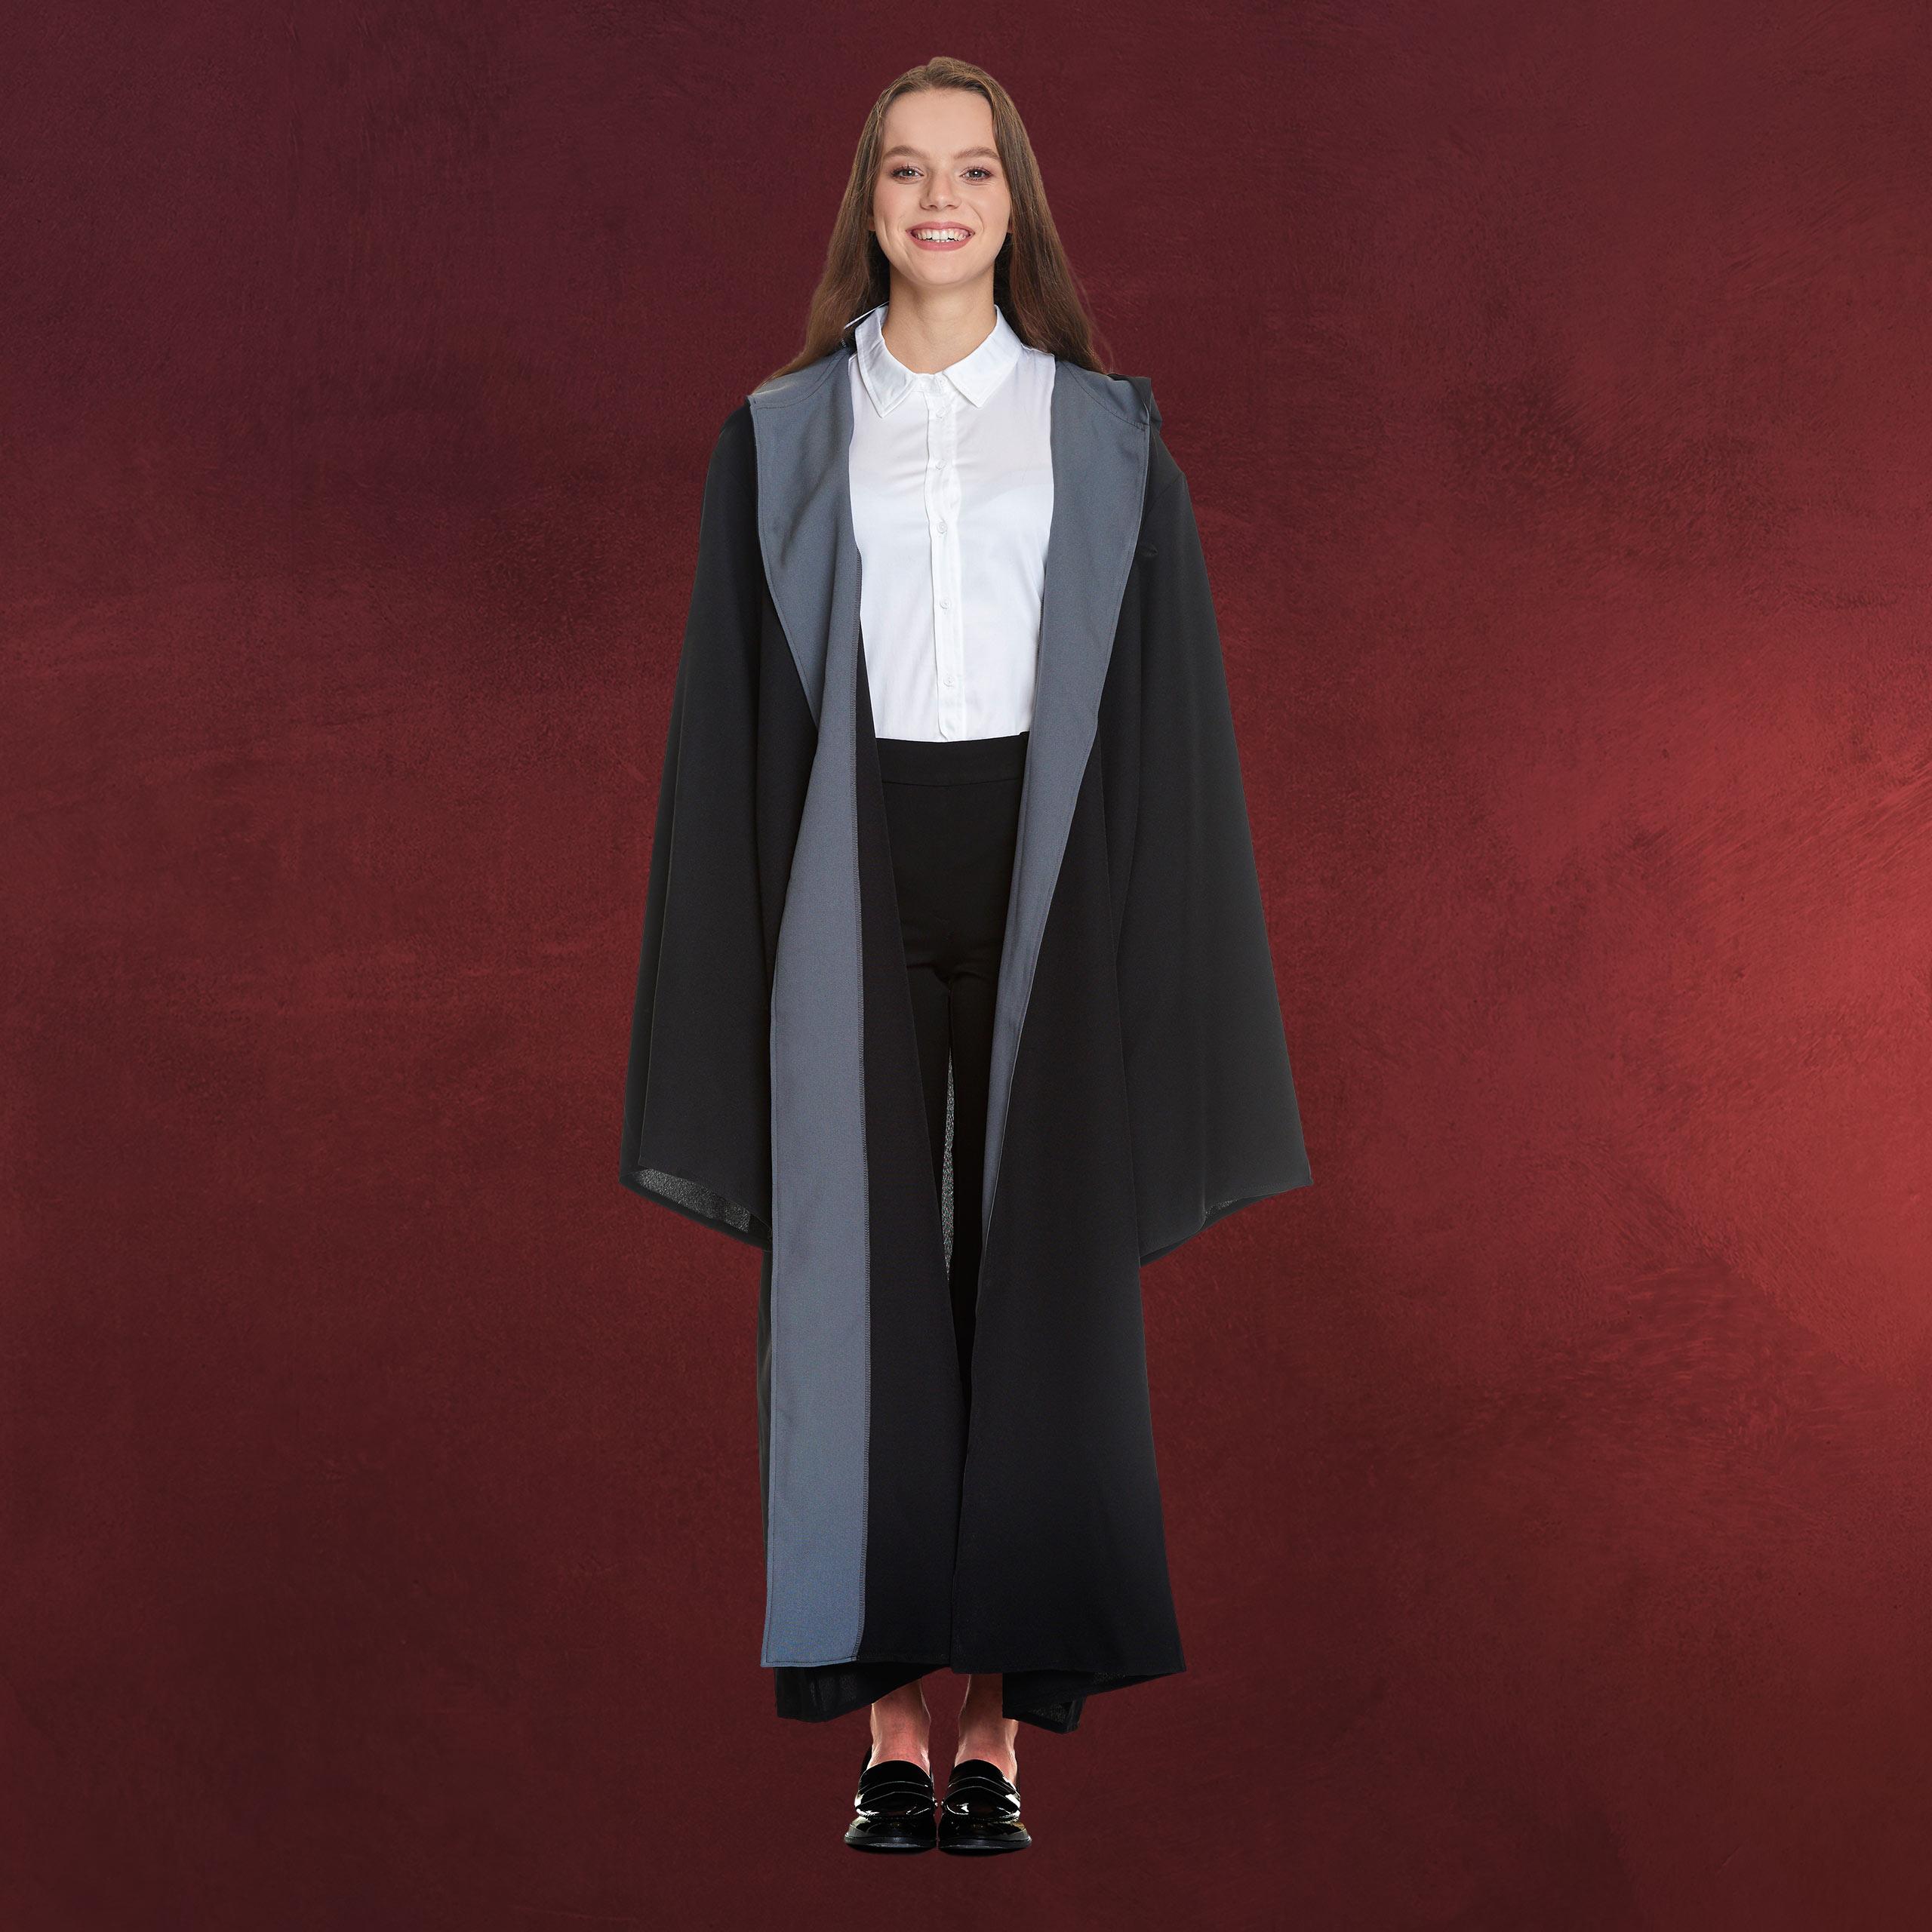 Zauberer Kostum Robe Mit Kapuze Fur Harry Potter Fans Elbenwald